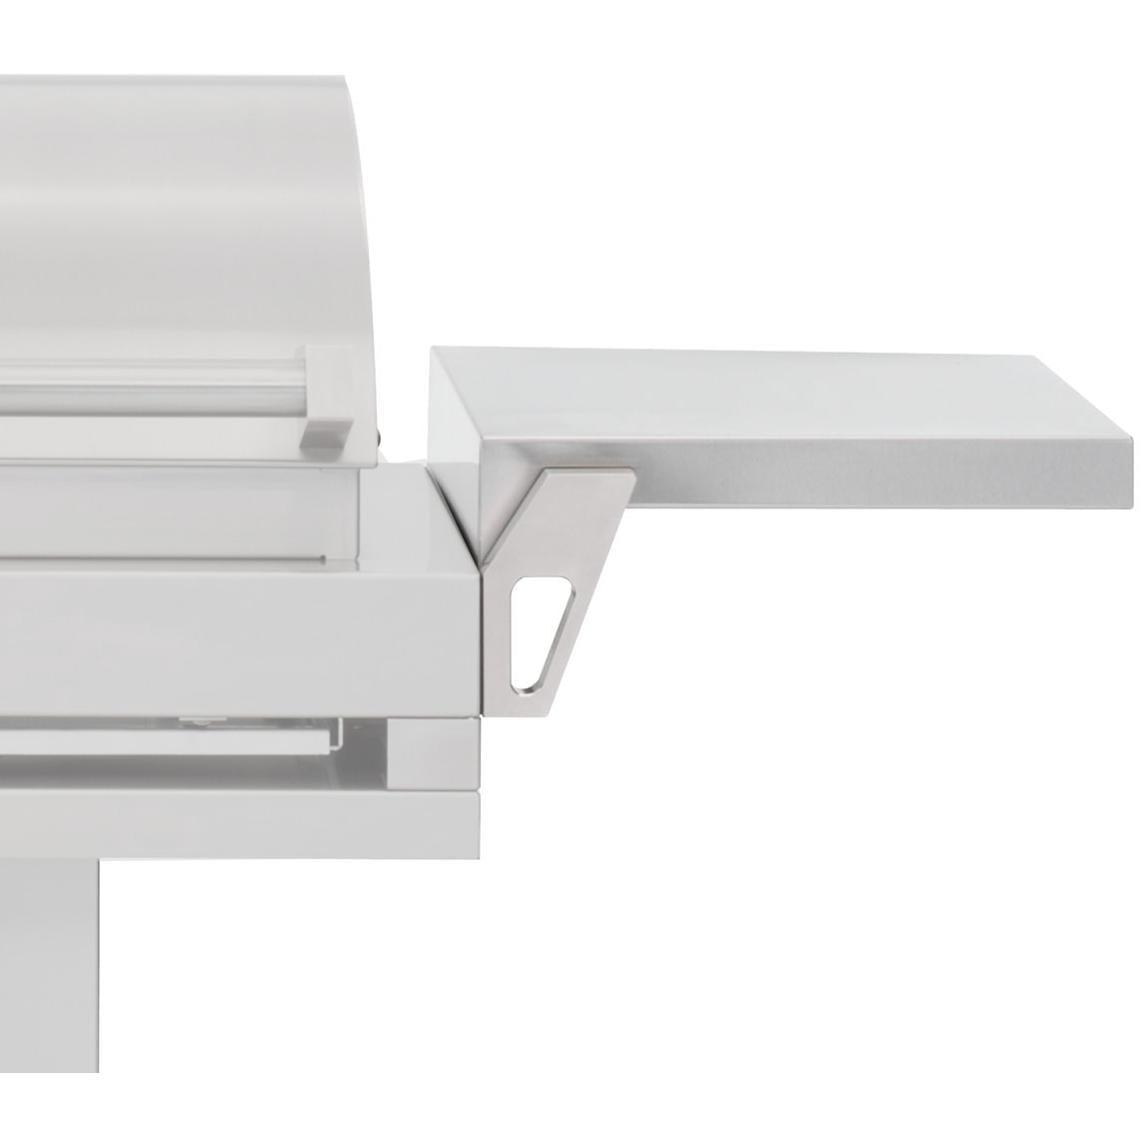 TEC G-Sport FR Series Stainless Steel Side Shelf